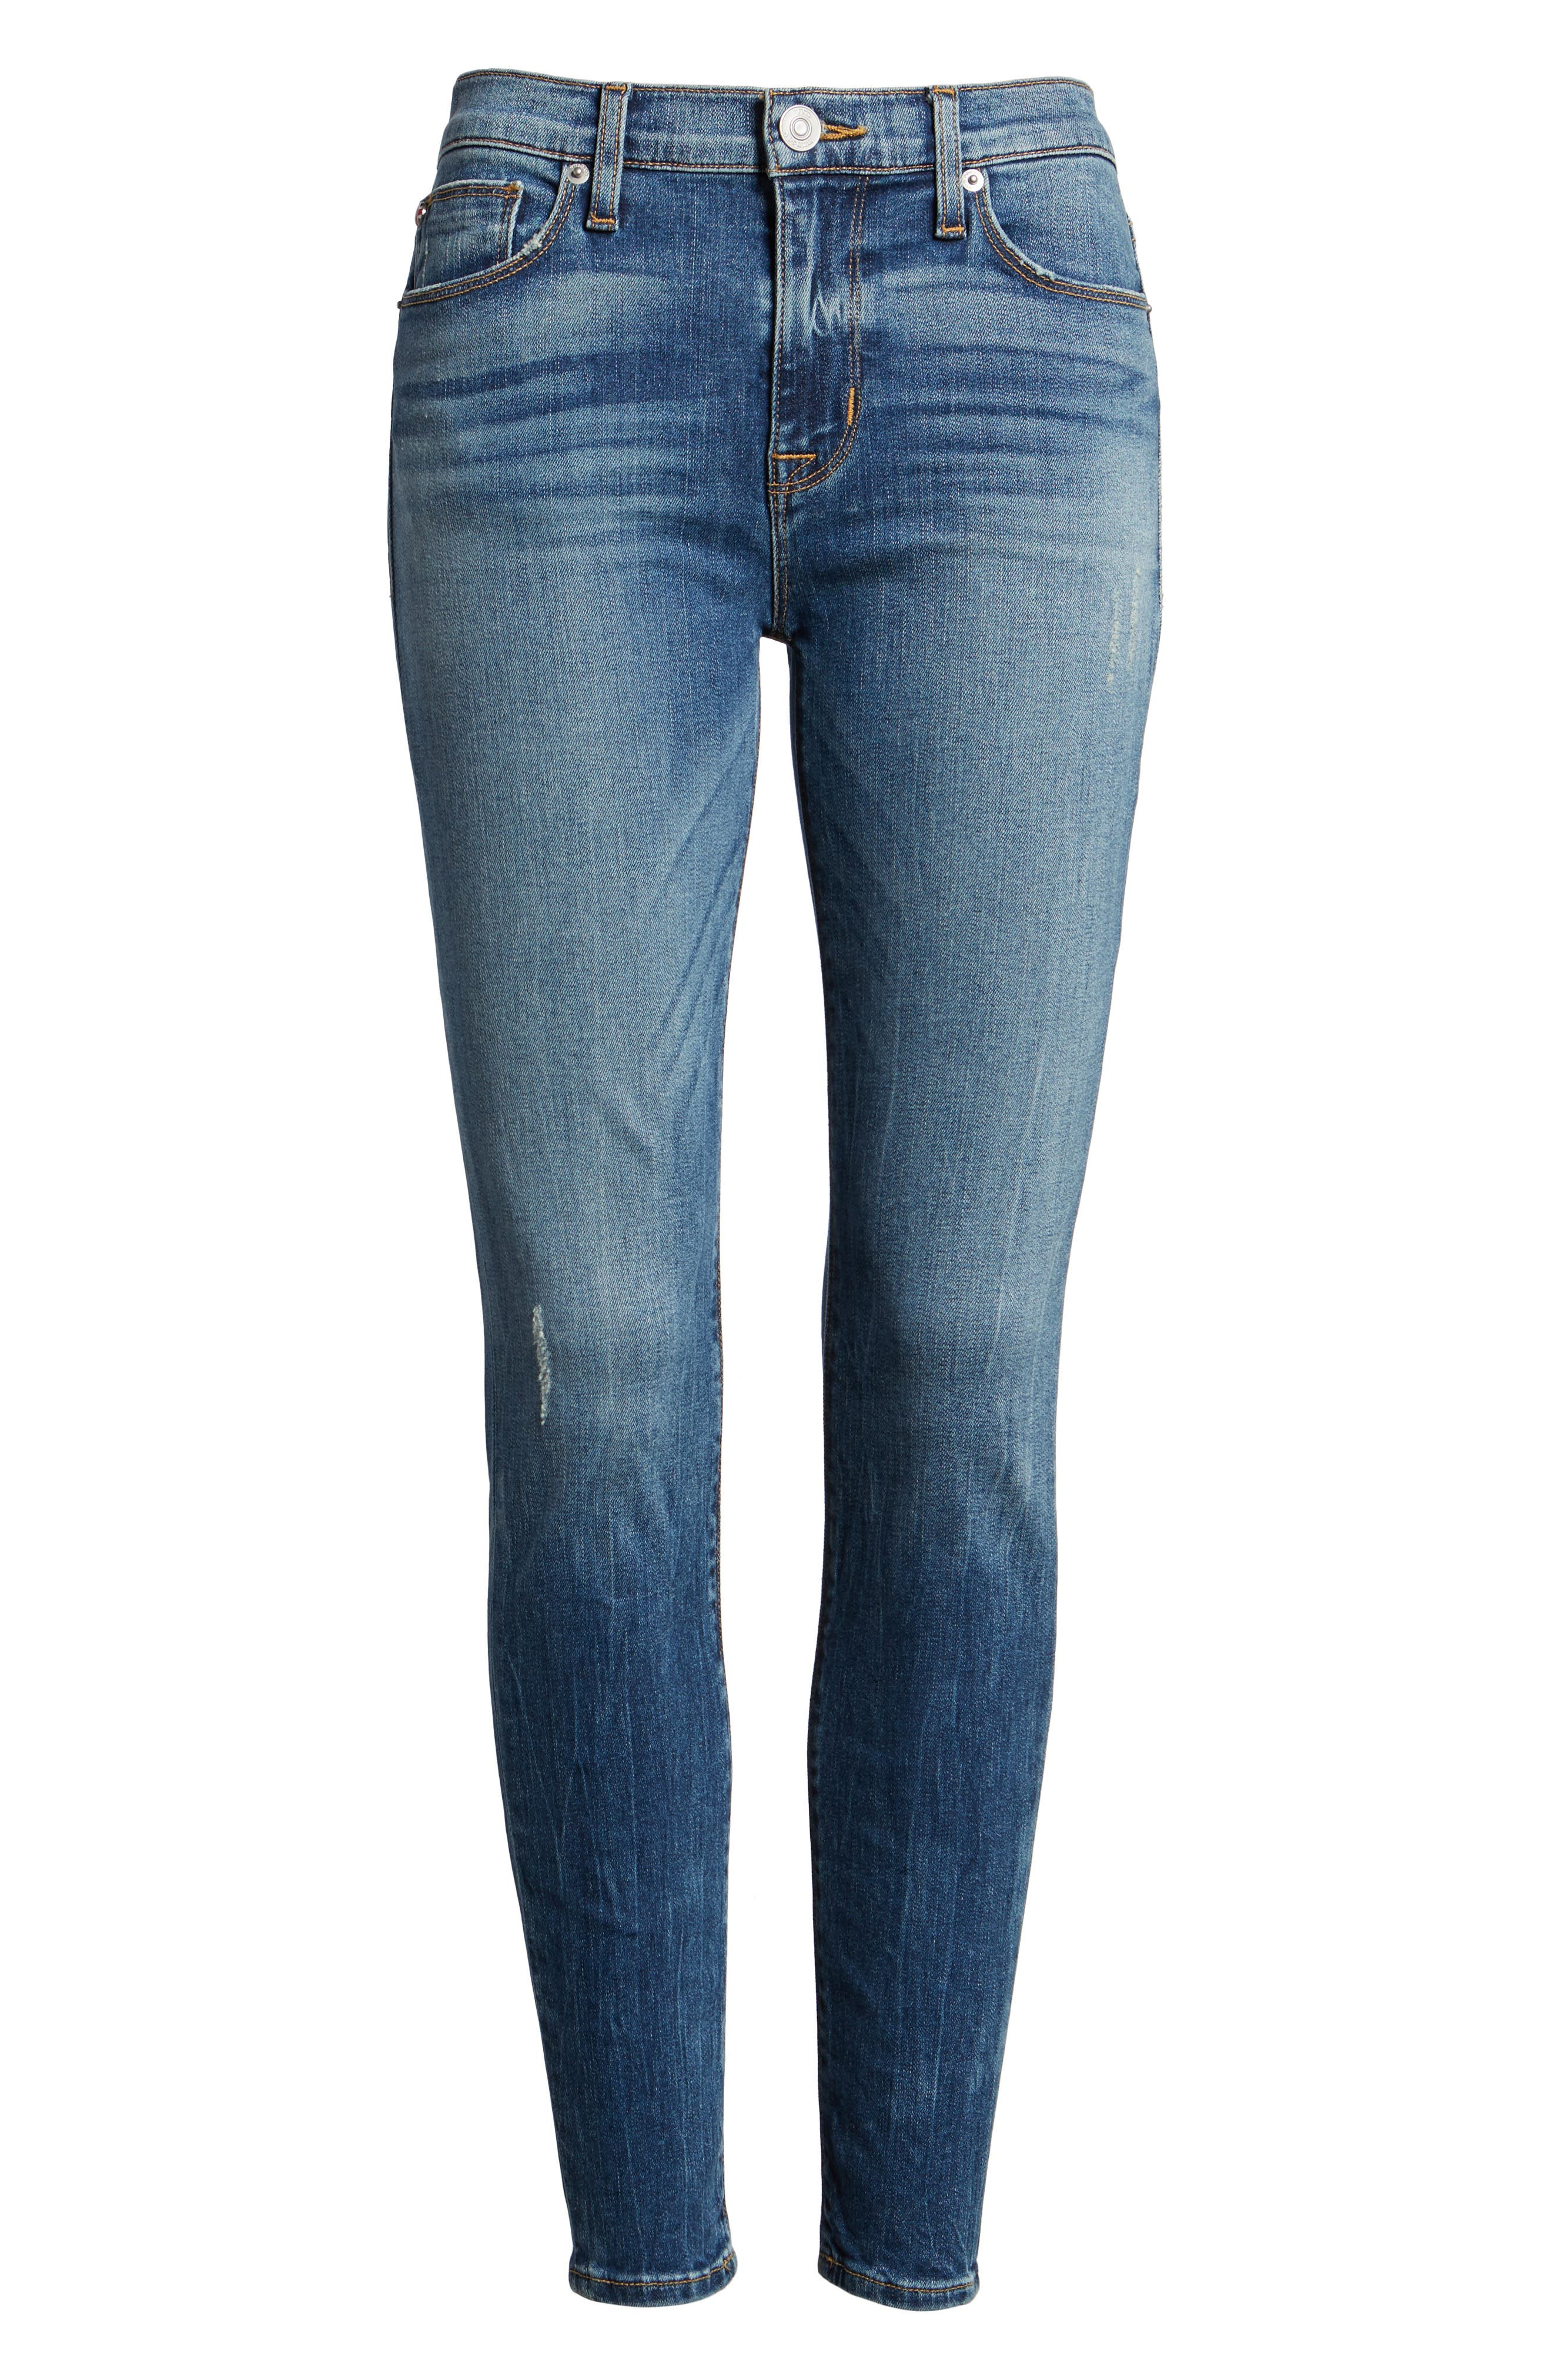 Nico Ankle Super Skinny Jeans,                         Main,                         color, Lifeline